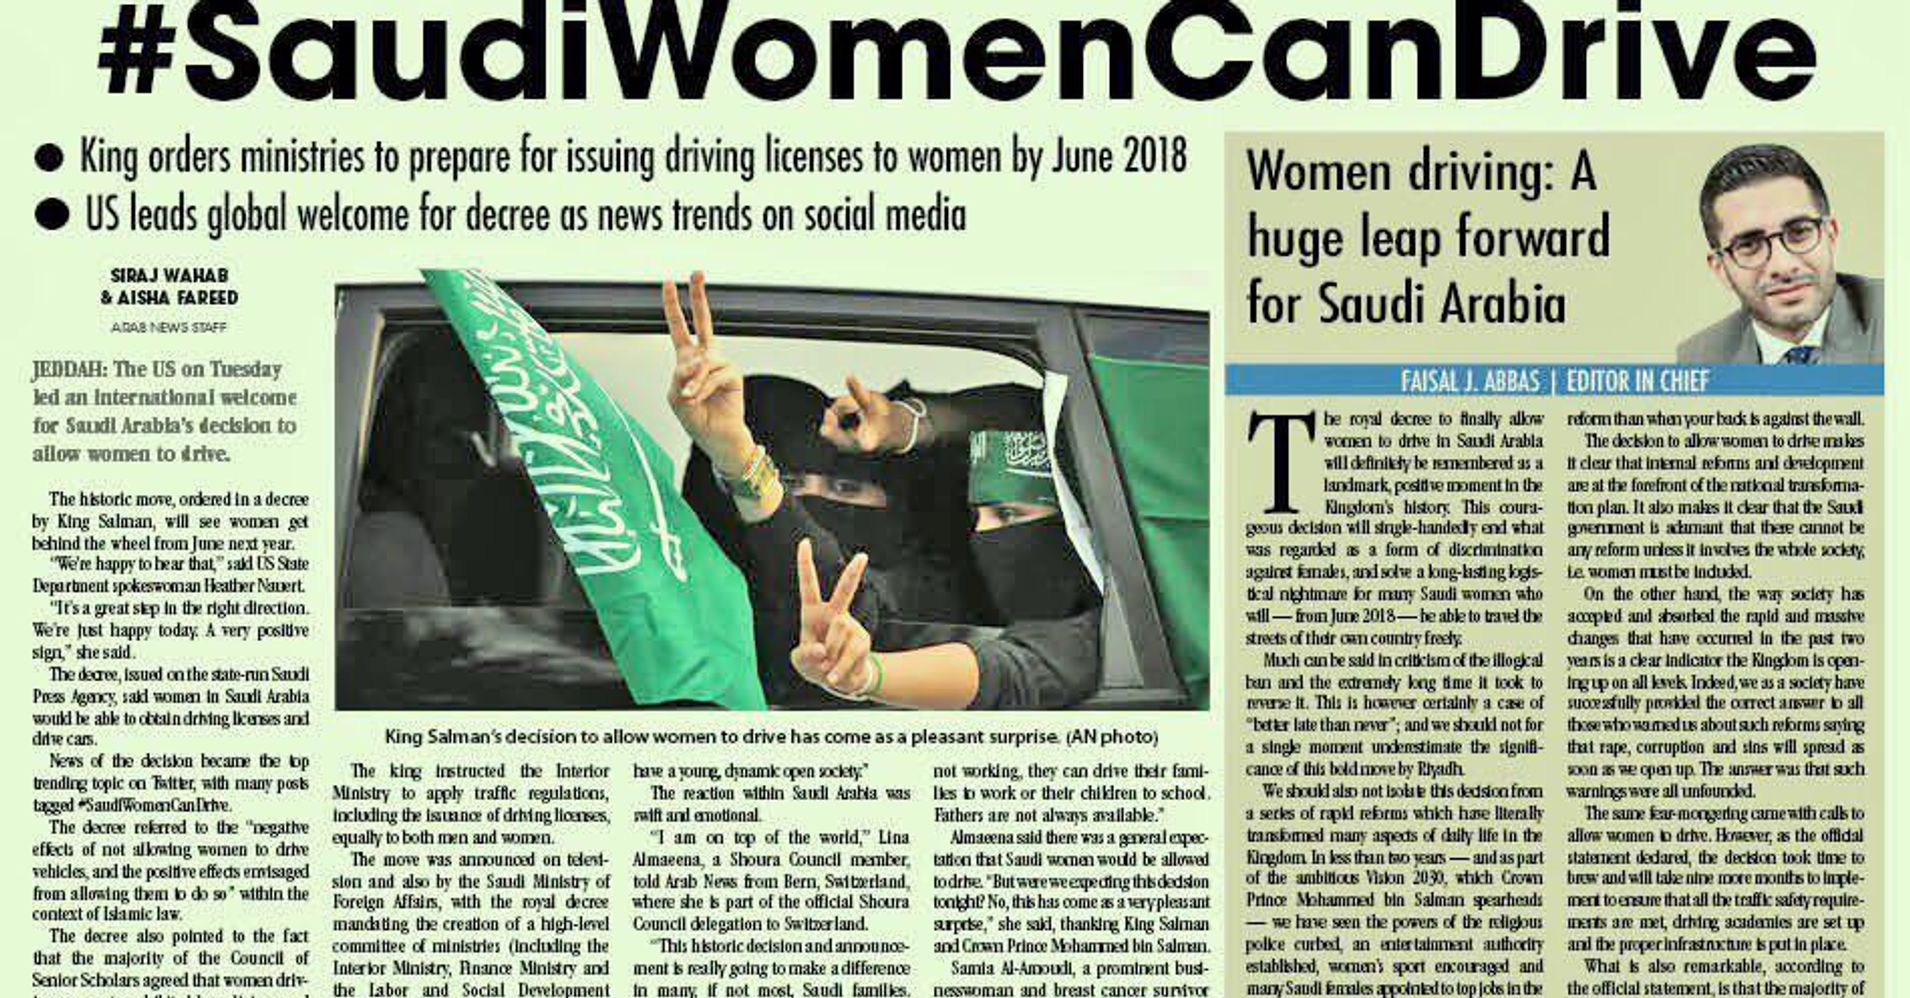 Essay: Women Driving in Saudi Arabia